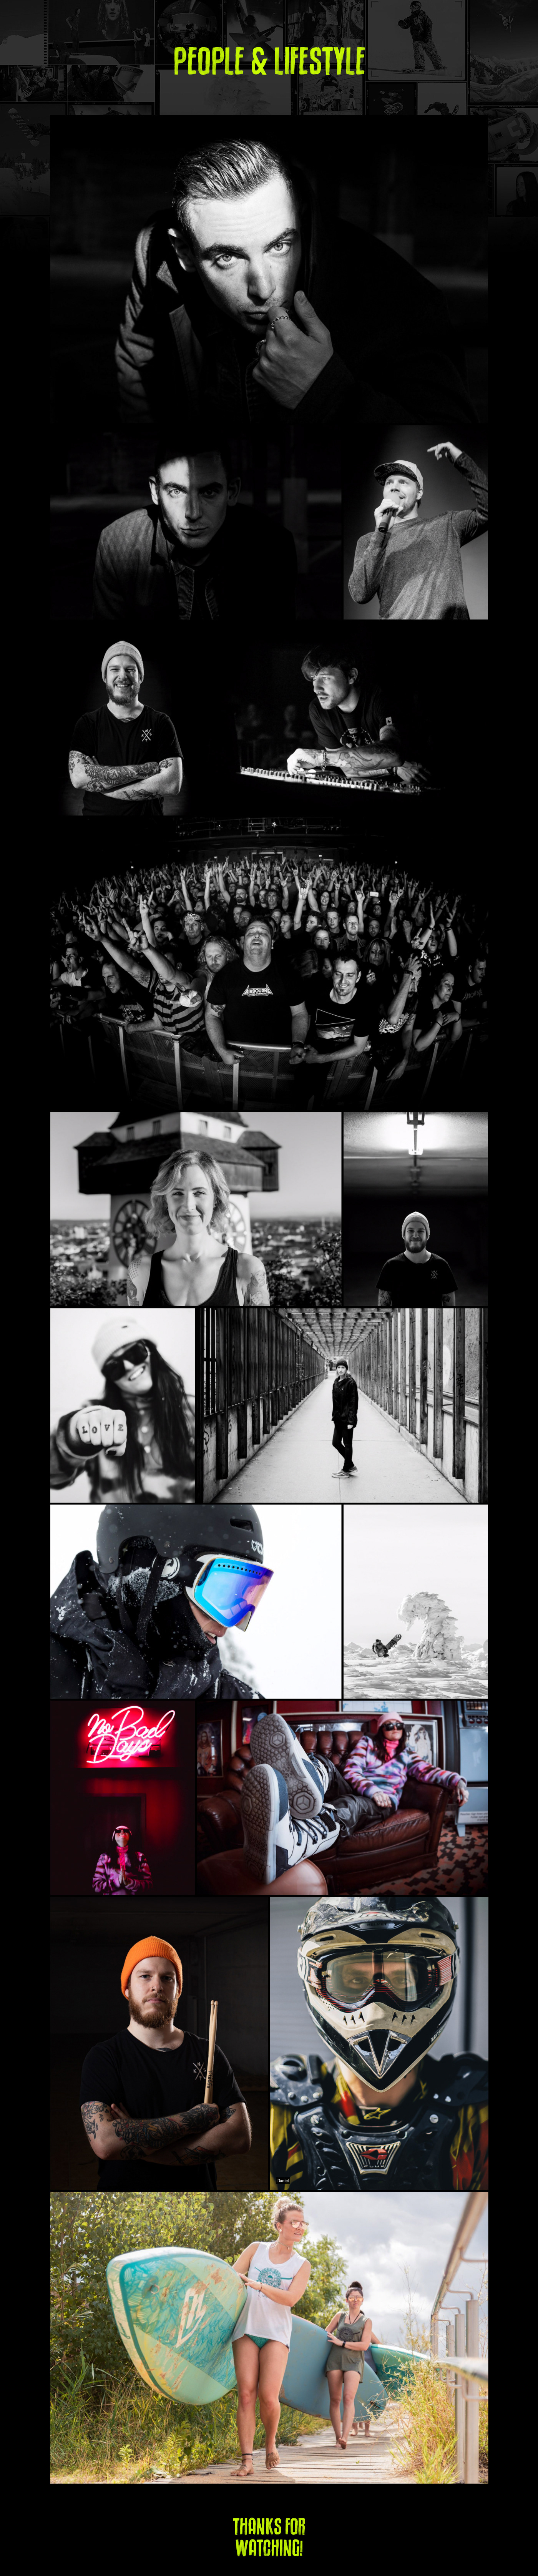 lifestyle onlocation people Photography  portrait